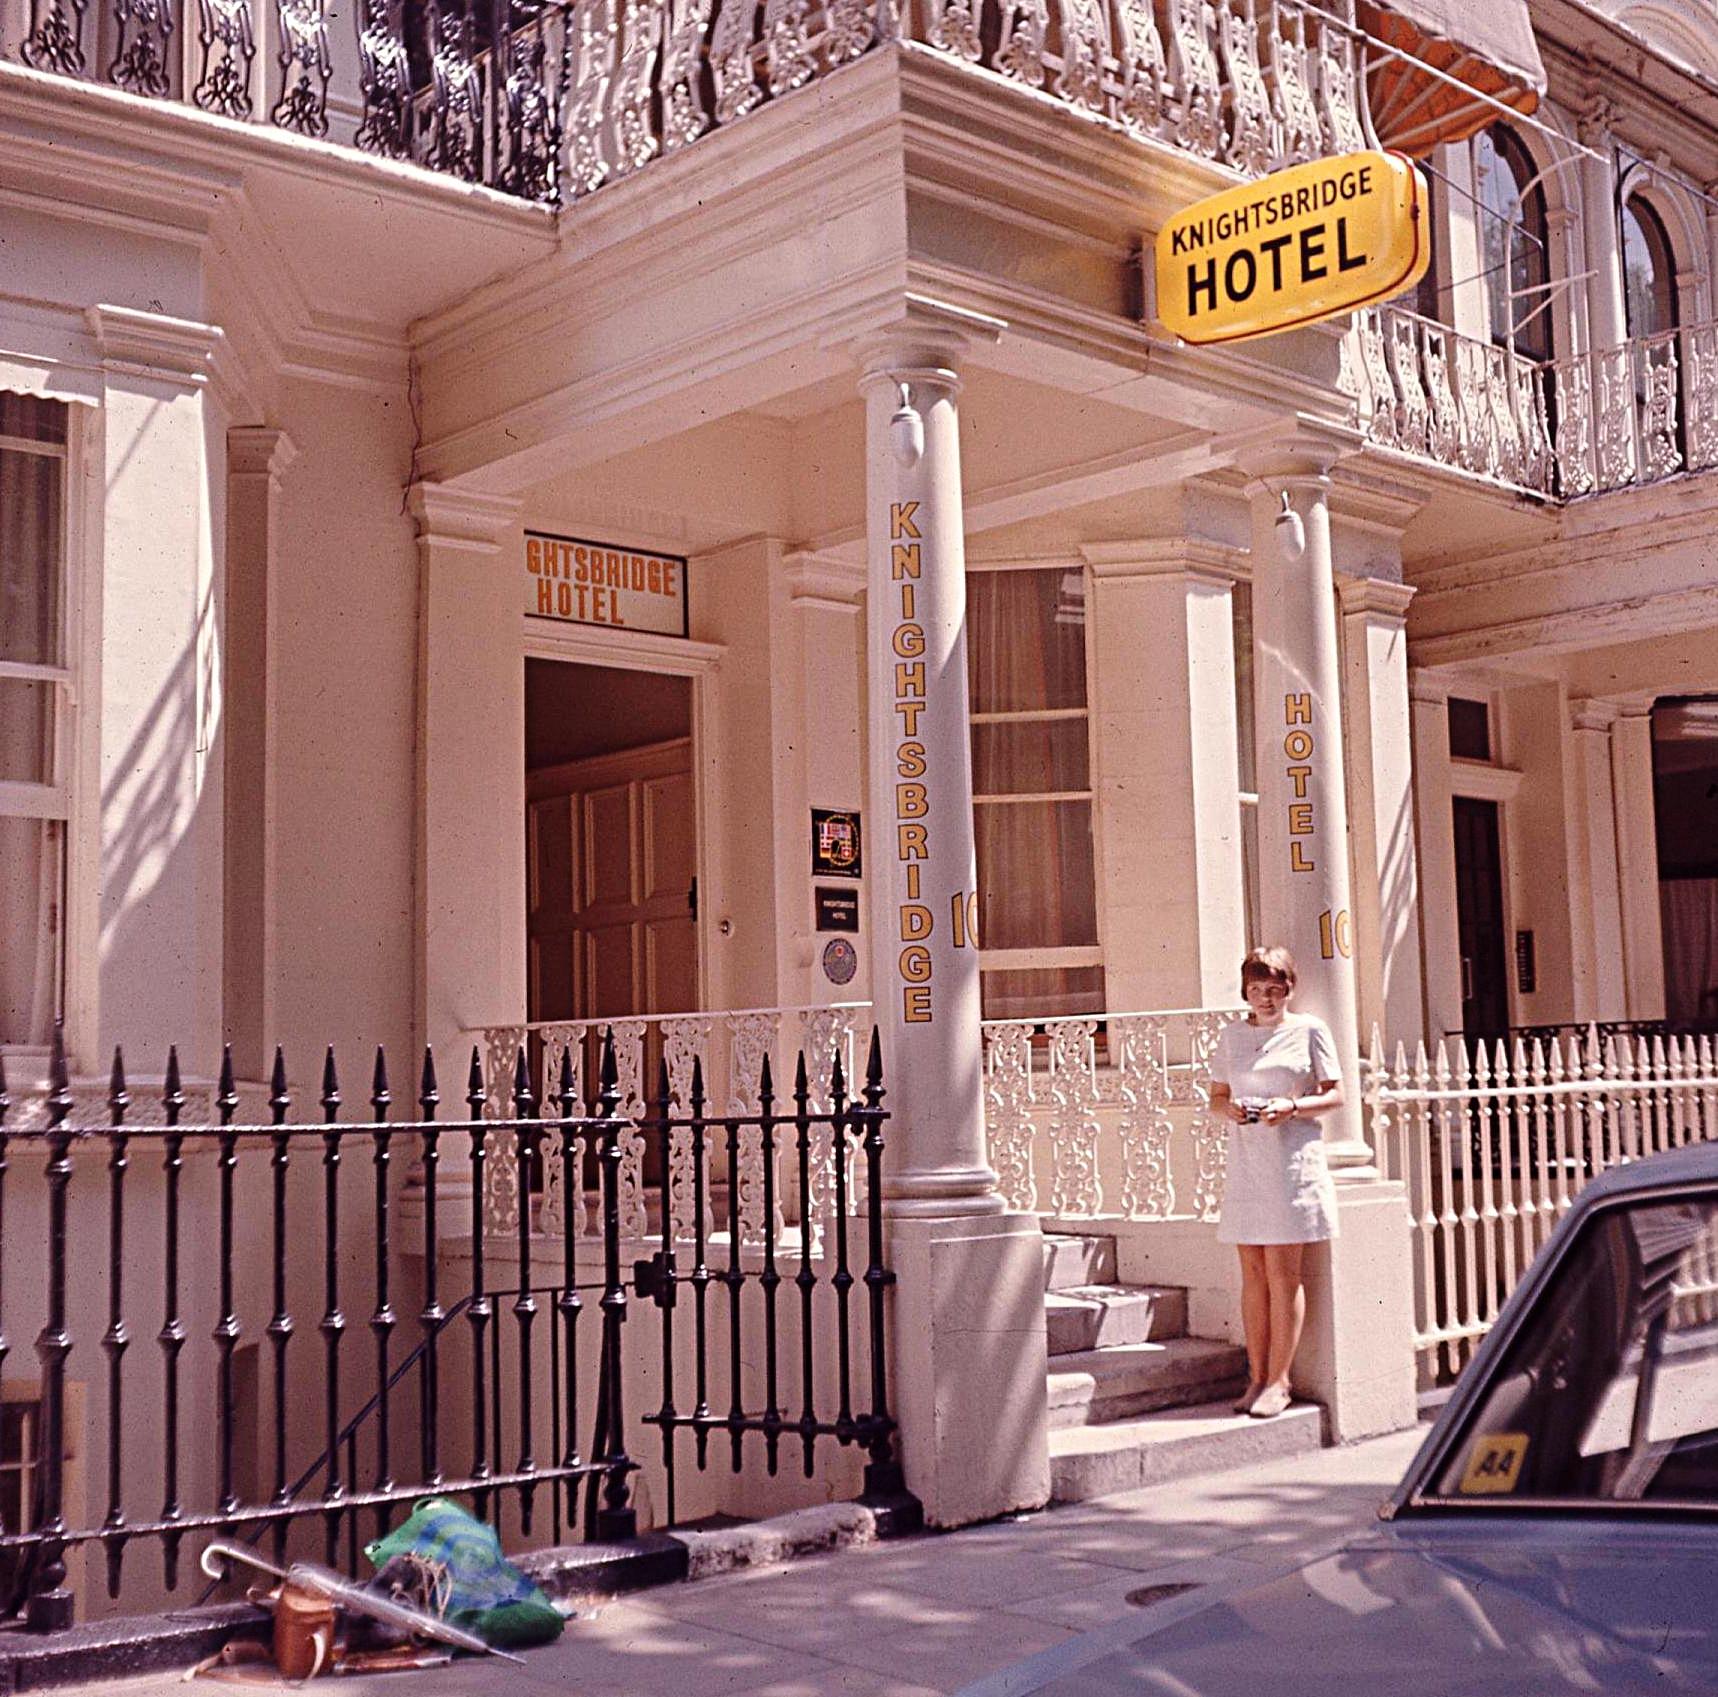 We found it! Anya plus clobber outside Polnareff's hotel.